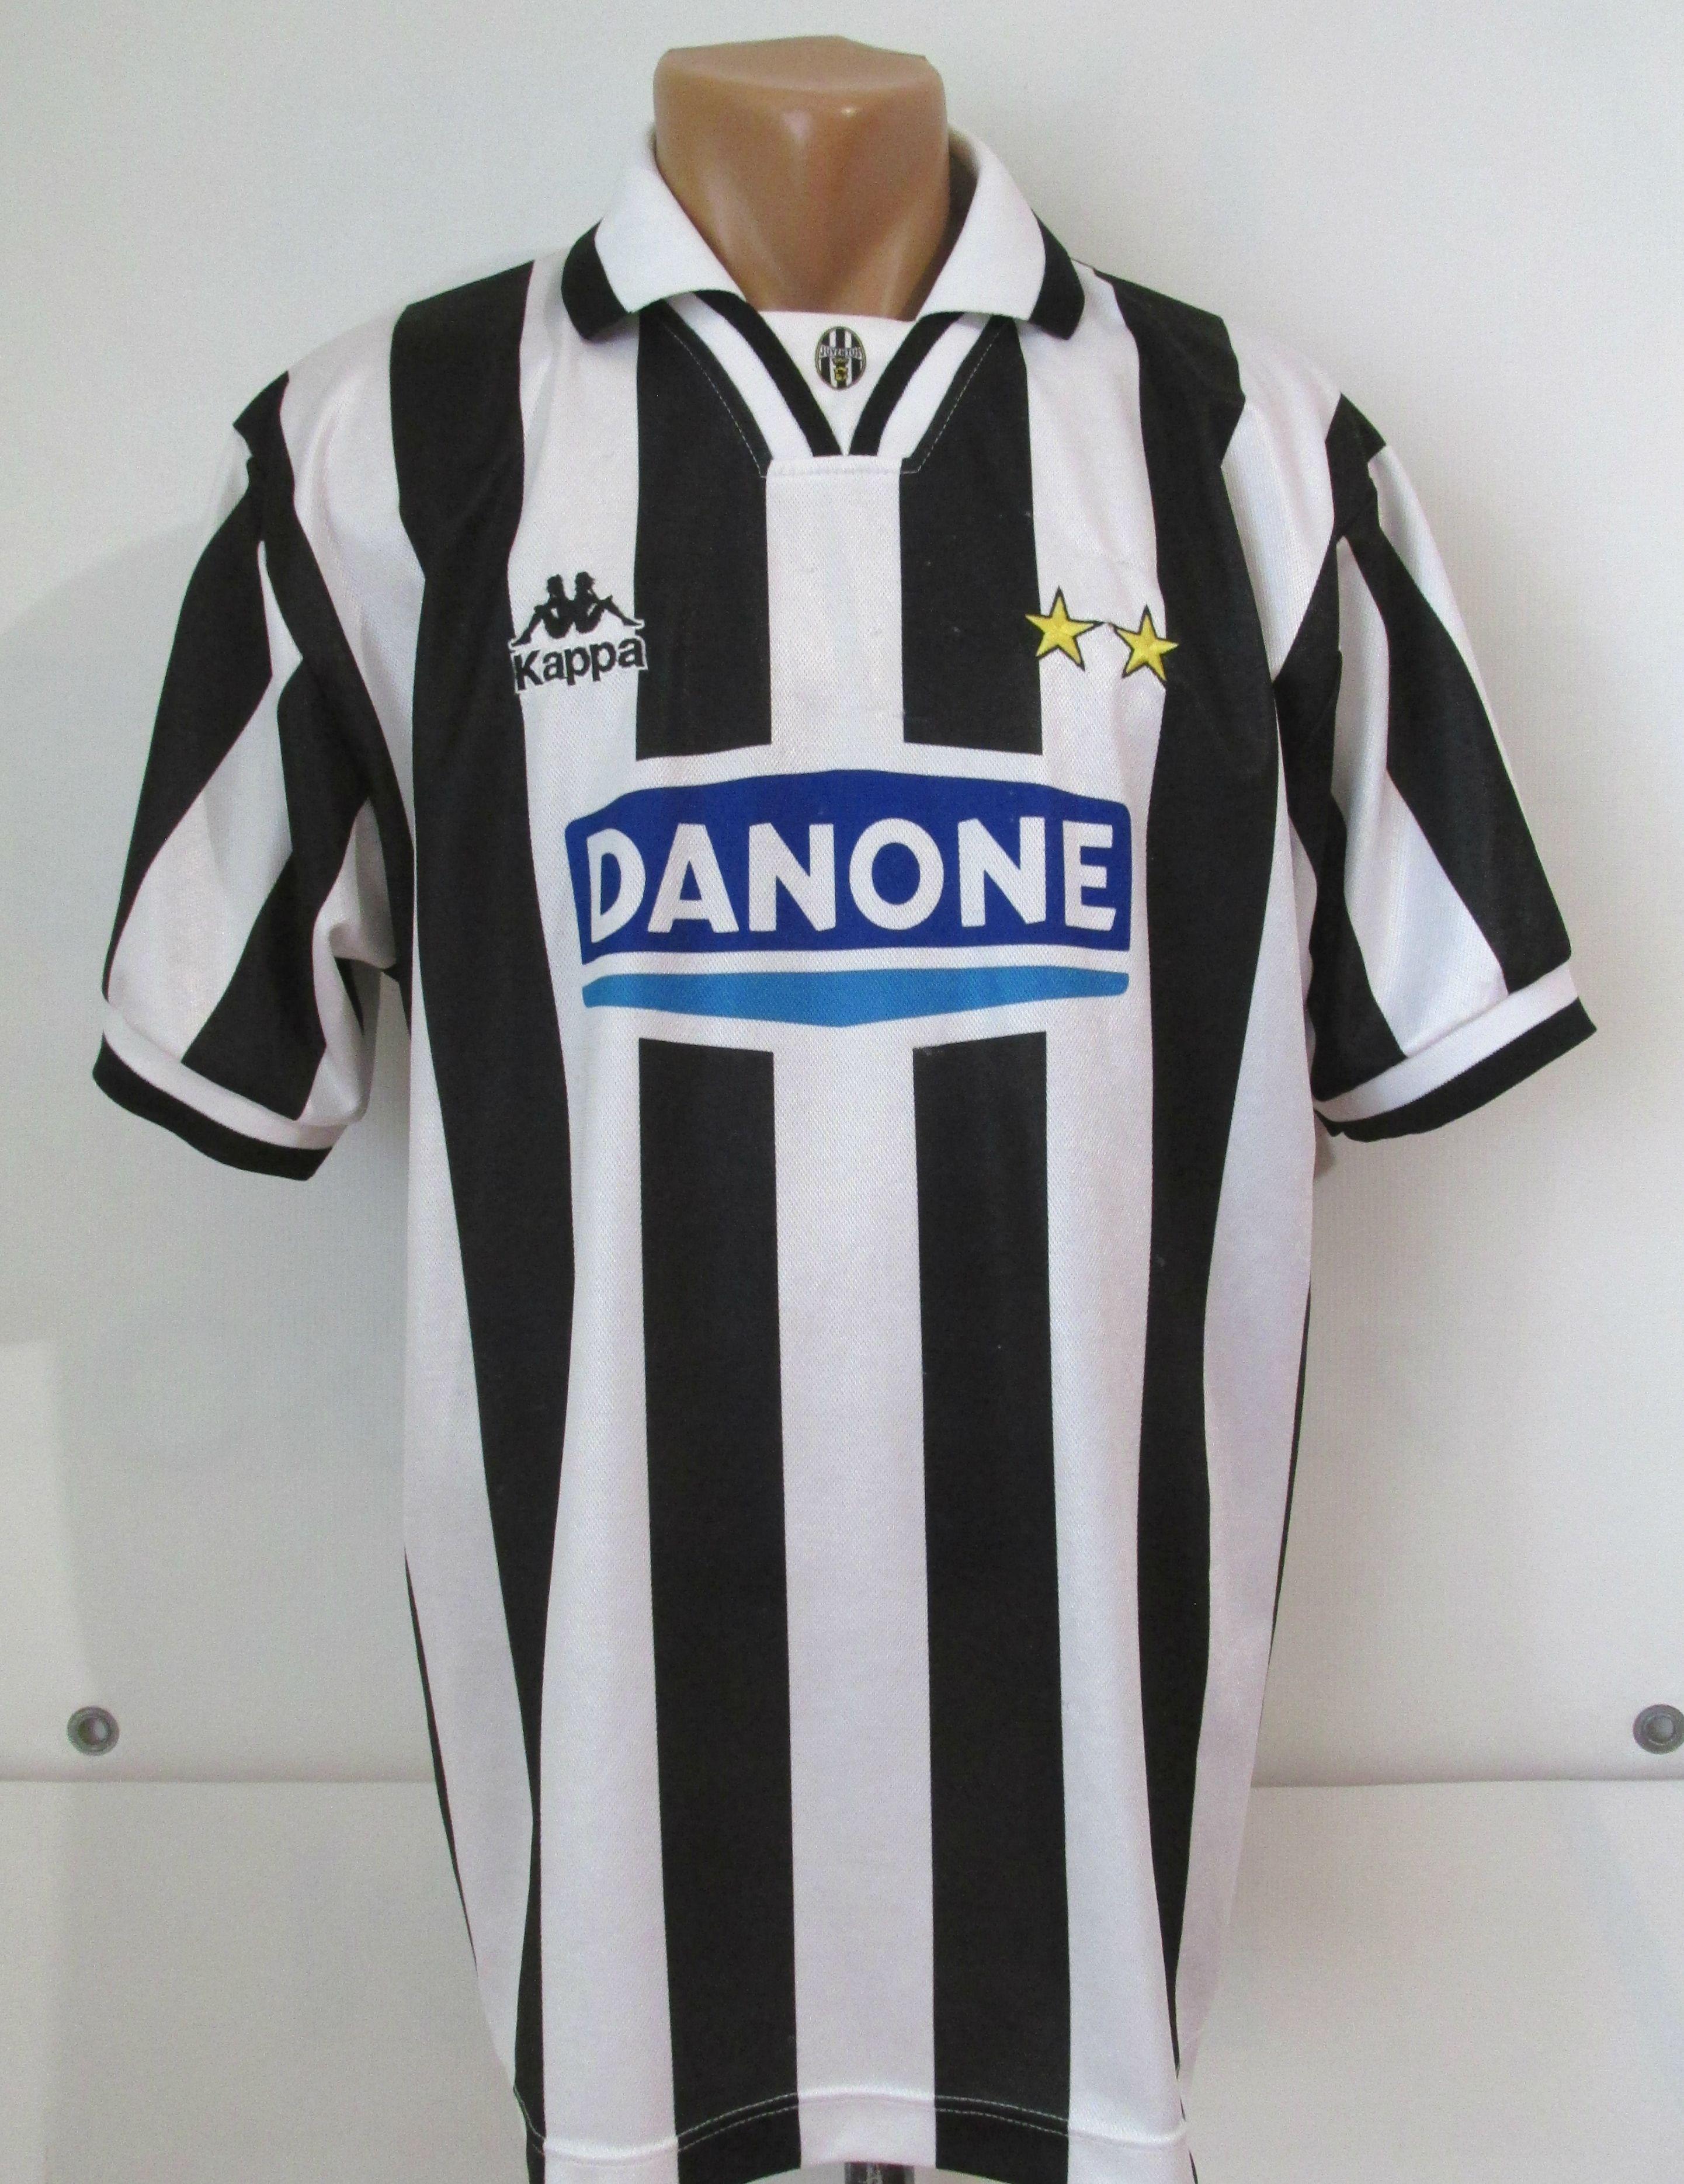 d83505b5f Juventus 1994 1995 home football shirt by Kappa Juve calcio Danjne vintage  90s retro Italy Maglia jersey soccer  Juventus  Juve  Kappa  italia  italy  ...